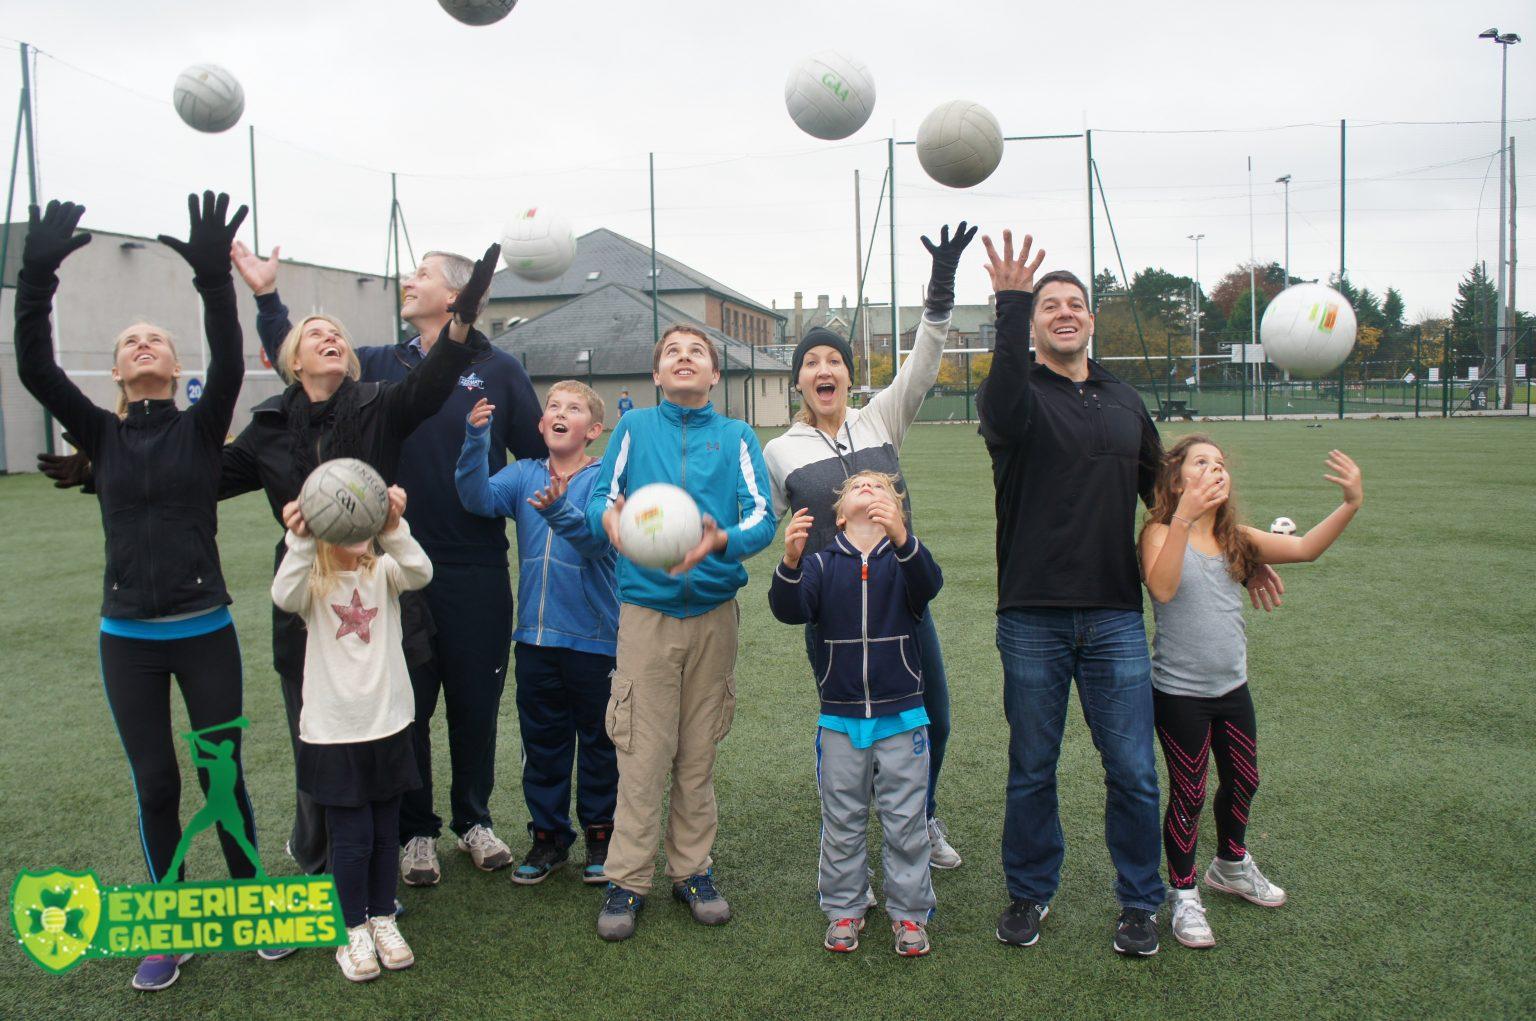 family fun when visiting ireland experience gaelic games